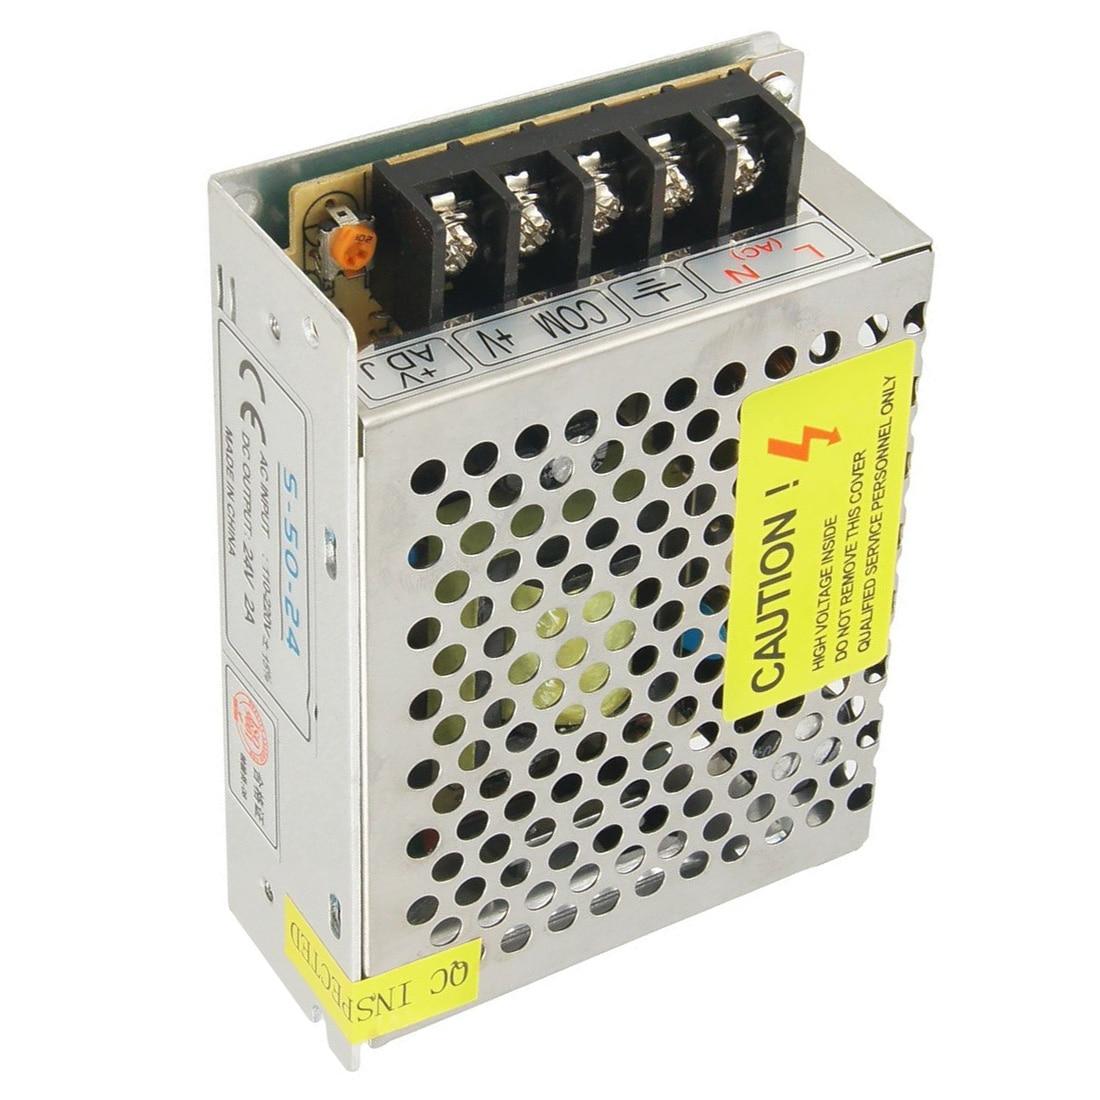 AC 110-220V DC 24V 2A 48W Switch Power Supply Transformer for LED Strip Light